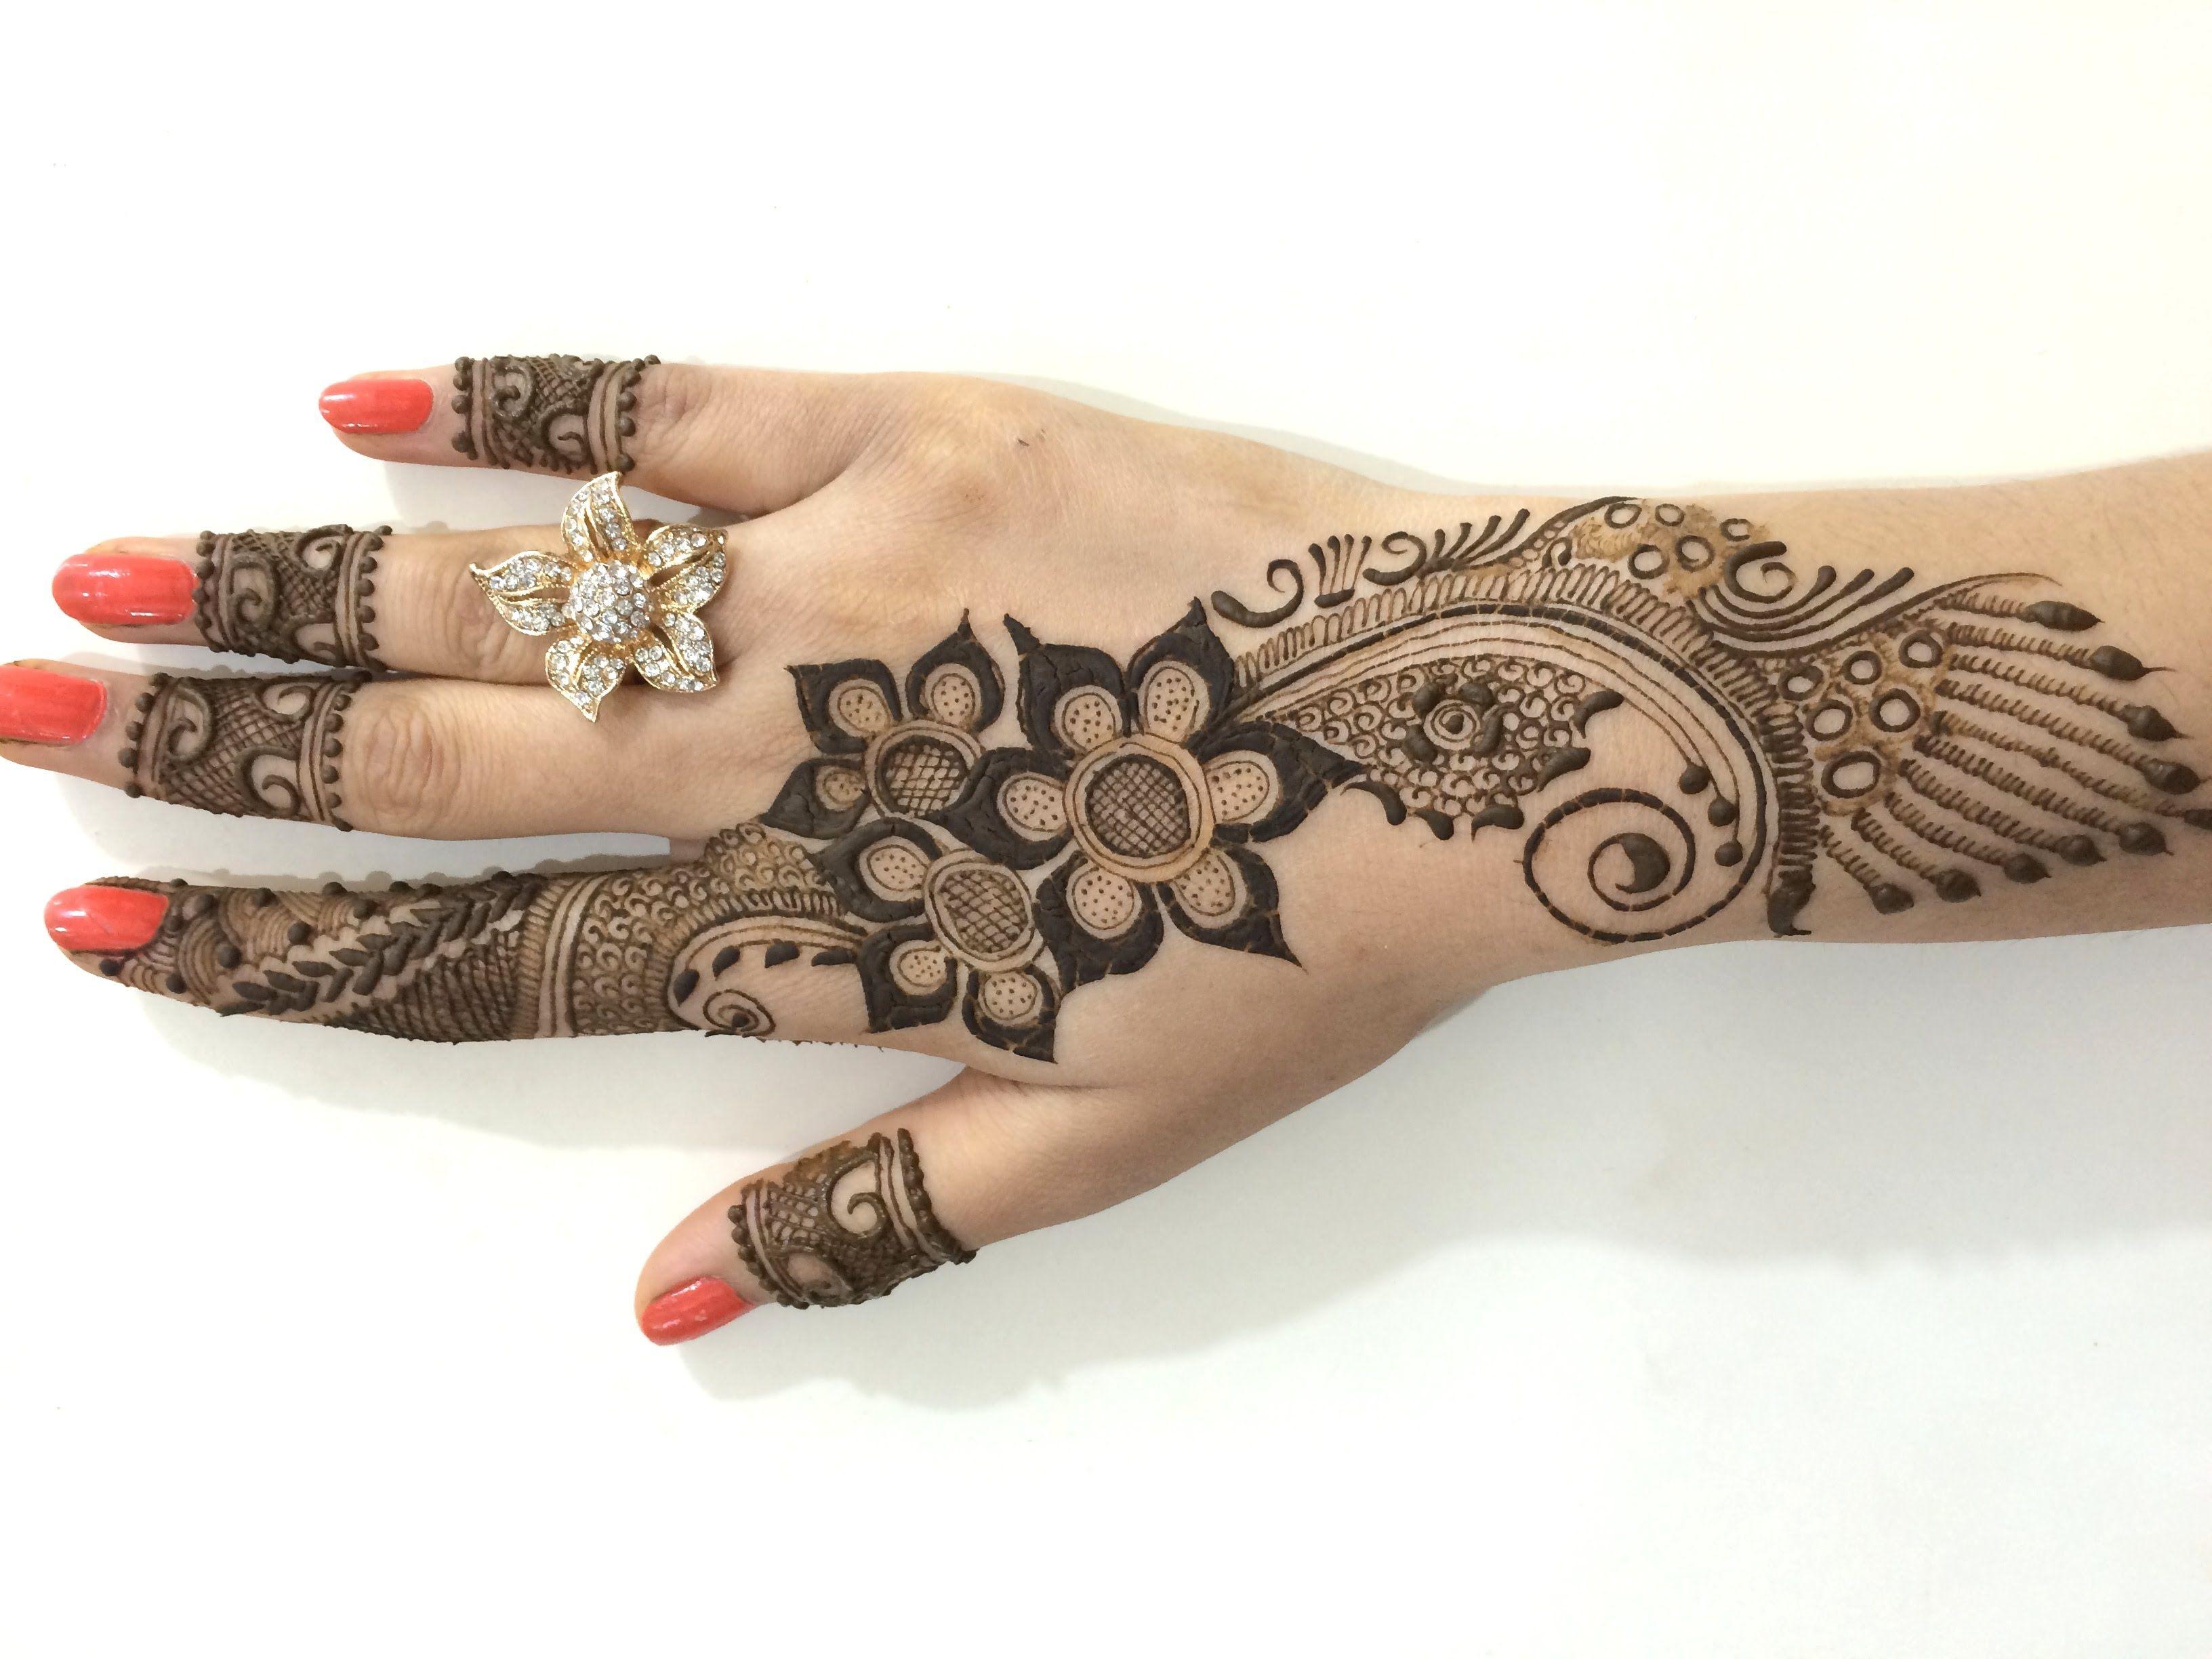 afbc31c849fdb Best Ornament Unique Arabic Henna Mehndi:Stylist Mehendi Designs For  Hands(Step By MehndiArtistica) - YouTube